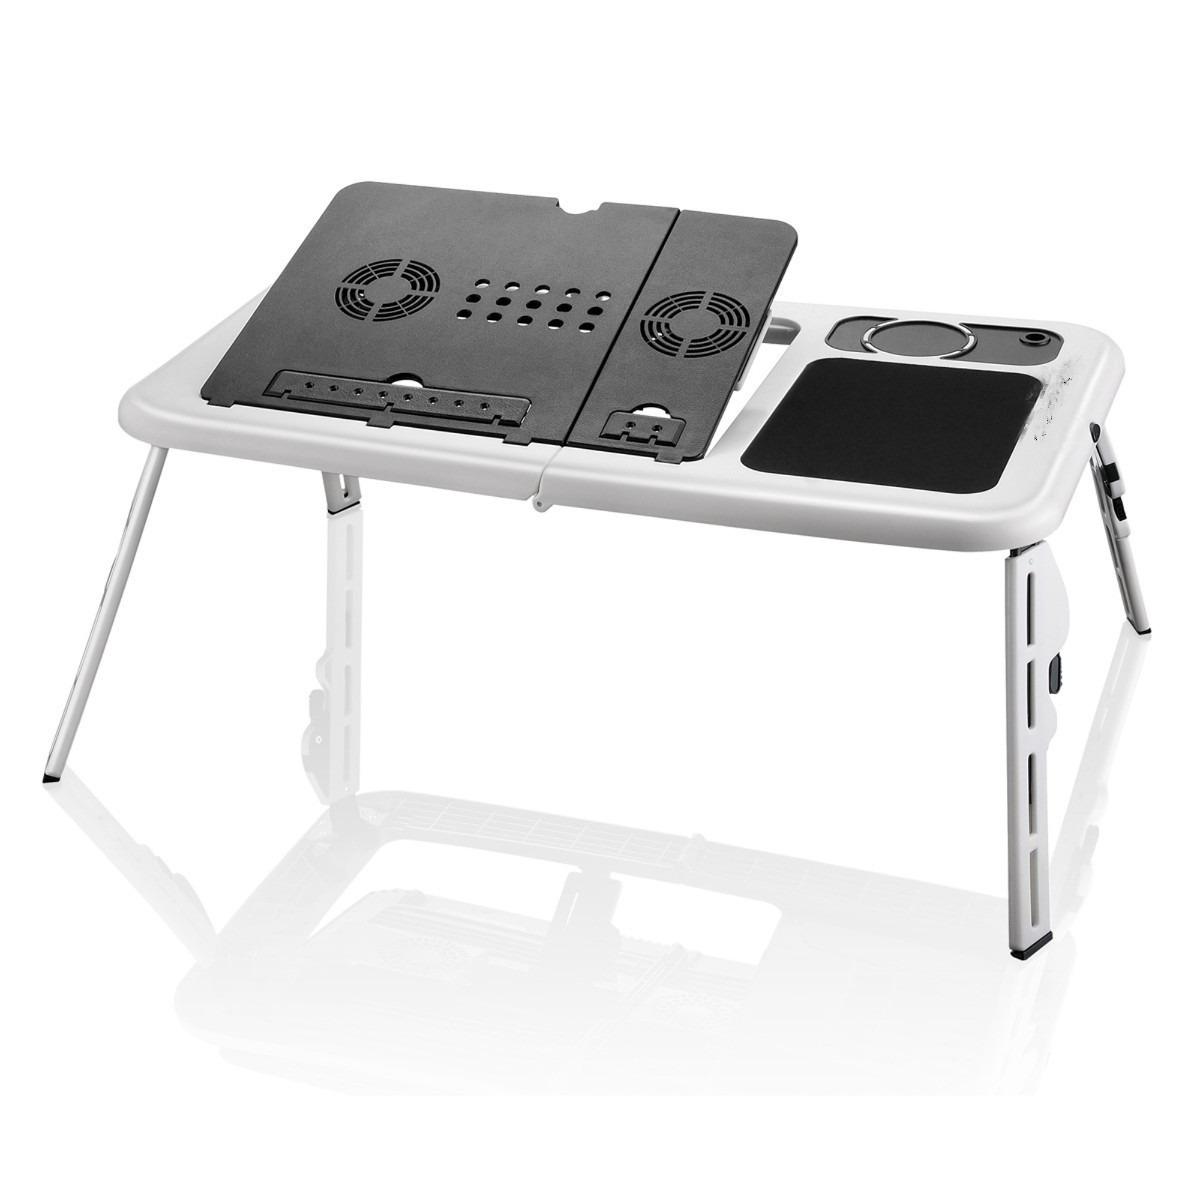 Mesa Notebook Com Cooler Dobrvel Suporte Base Mouse Copo